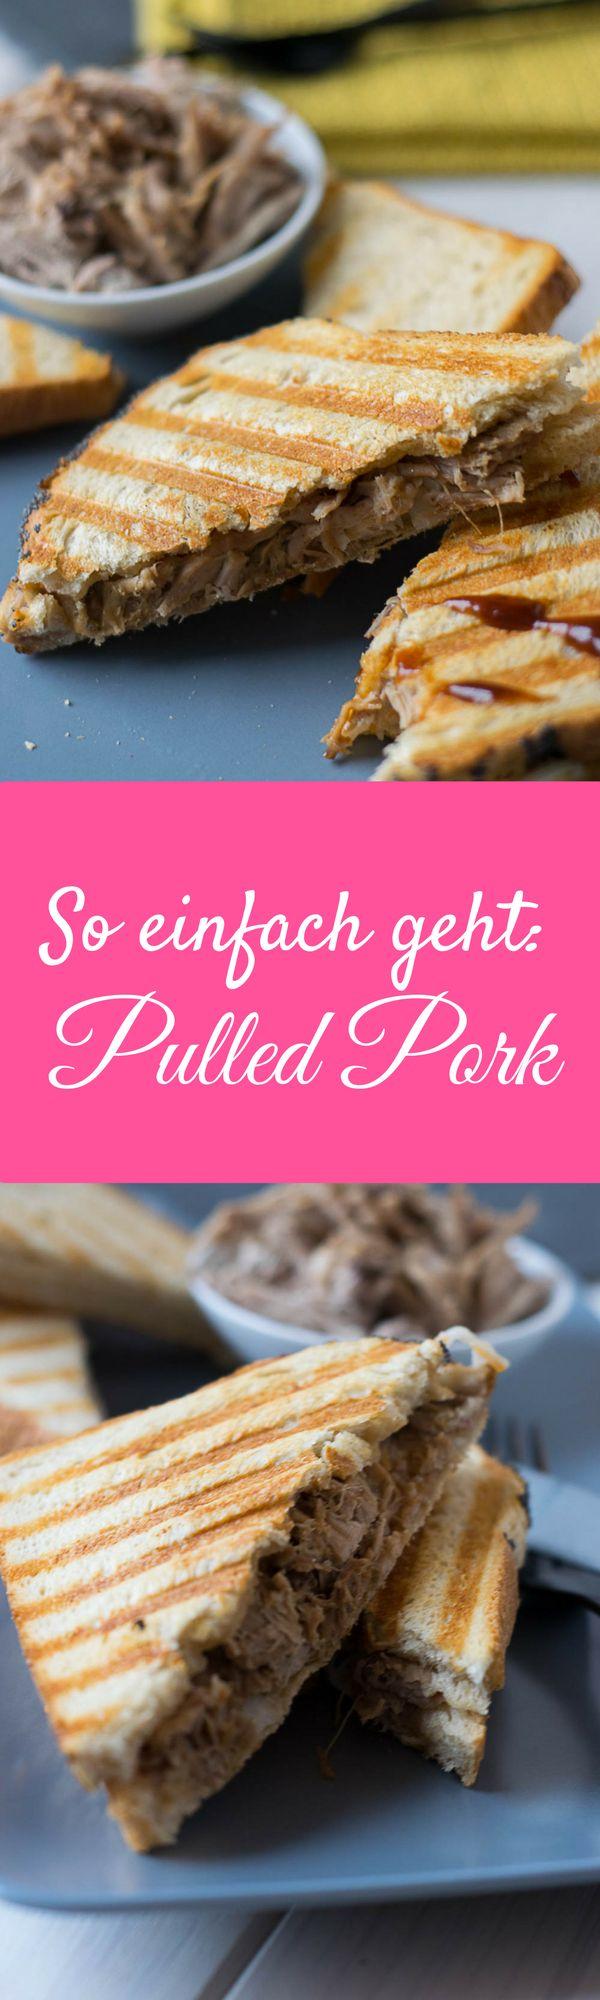 Pulled Pork Sandwich - USA Food